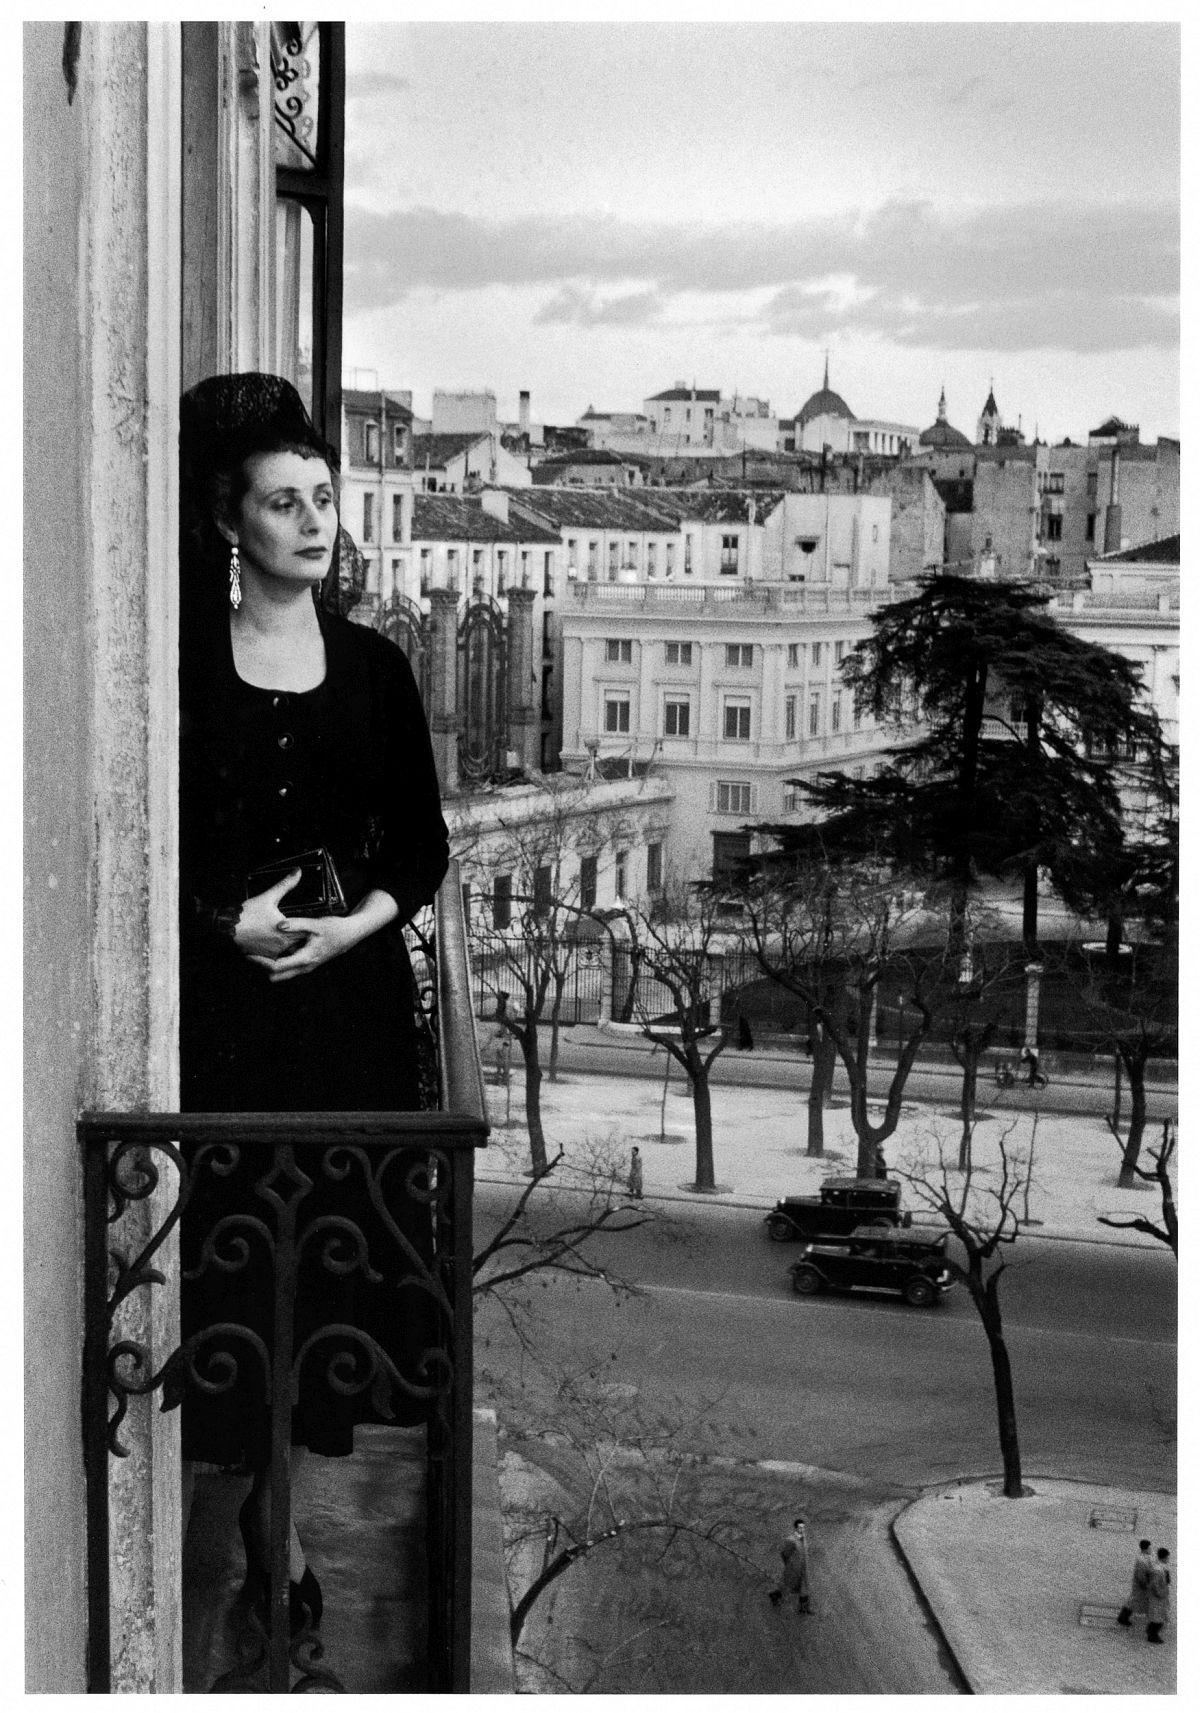 Inge Morath Dona Mercedes Formica auf dem Balkon in der Calle de Recoletos, Madrid, 1955 © Magnum Photos / Inge Morath Foundation / Fotohof archiv